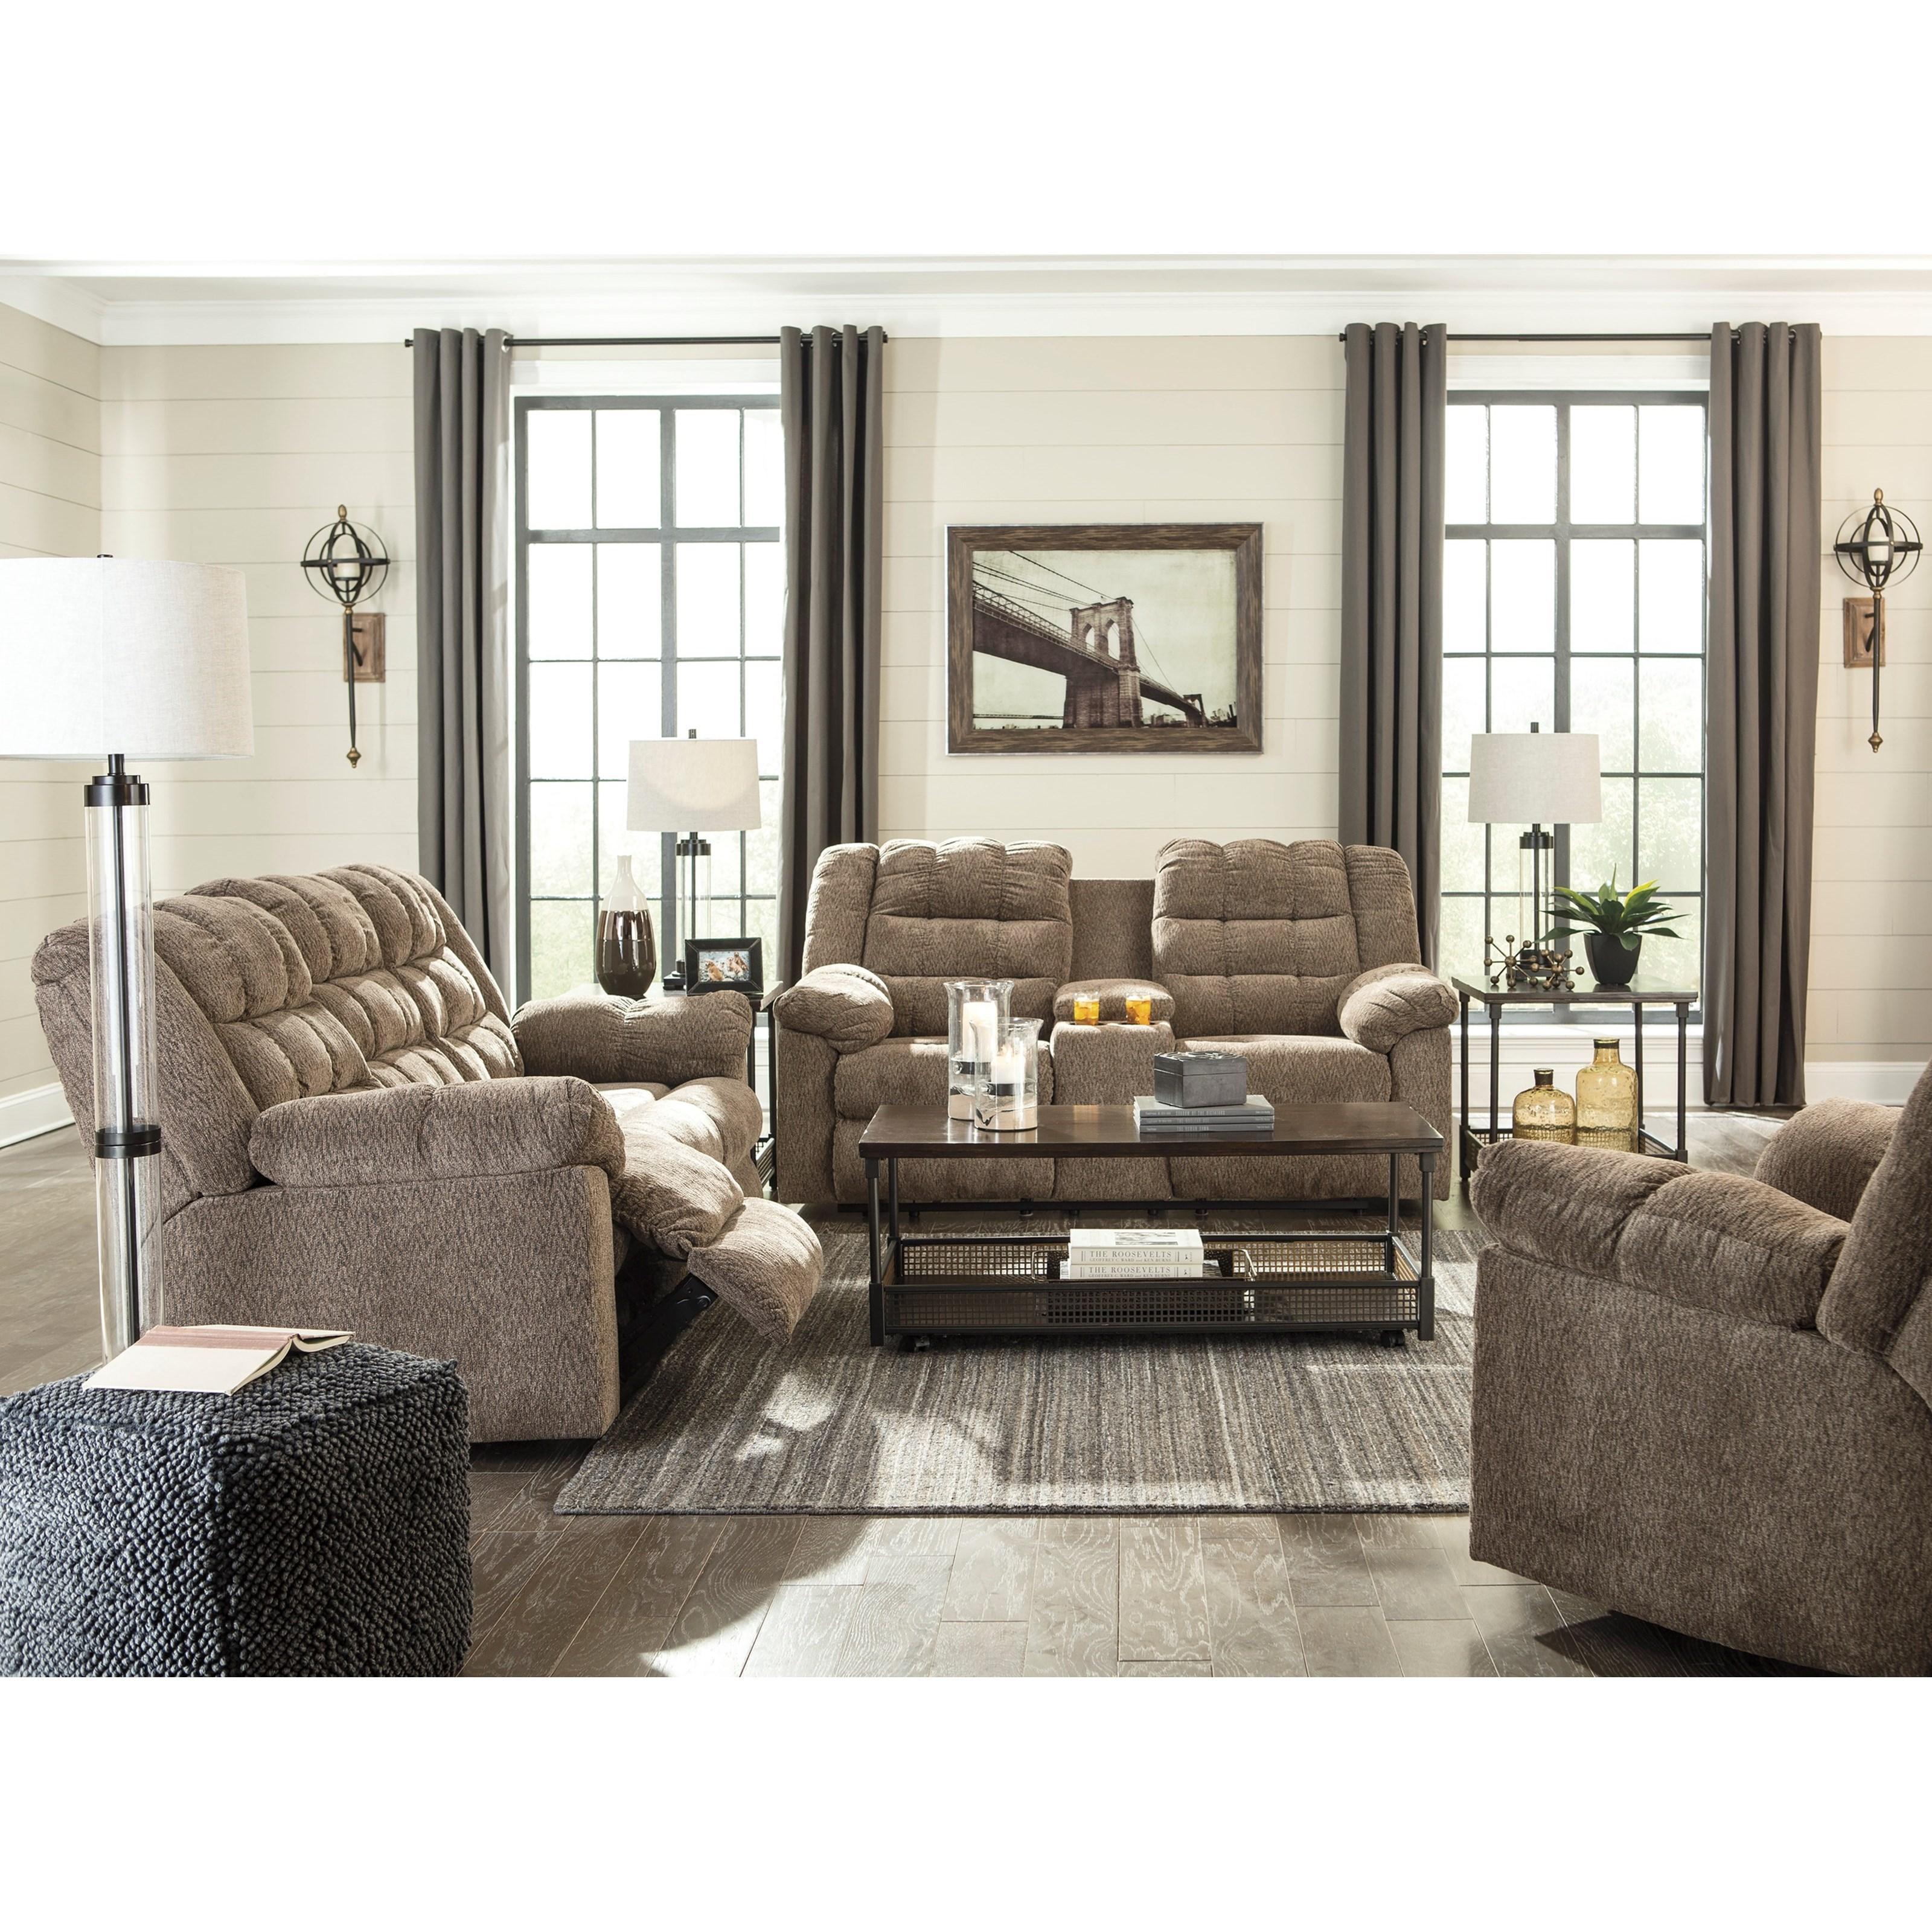 Ashley Furniture Manufacturer: Signature Design By Ashley Workhorse Casual Rocker